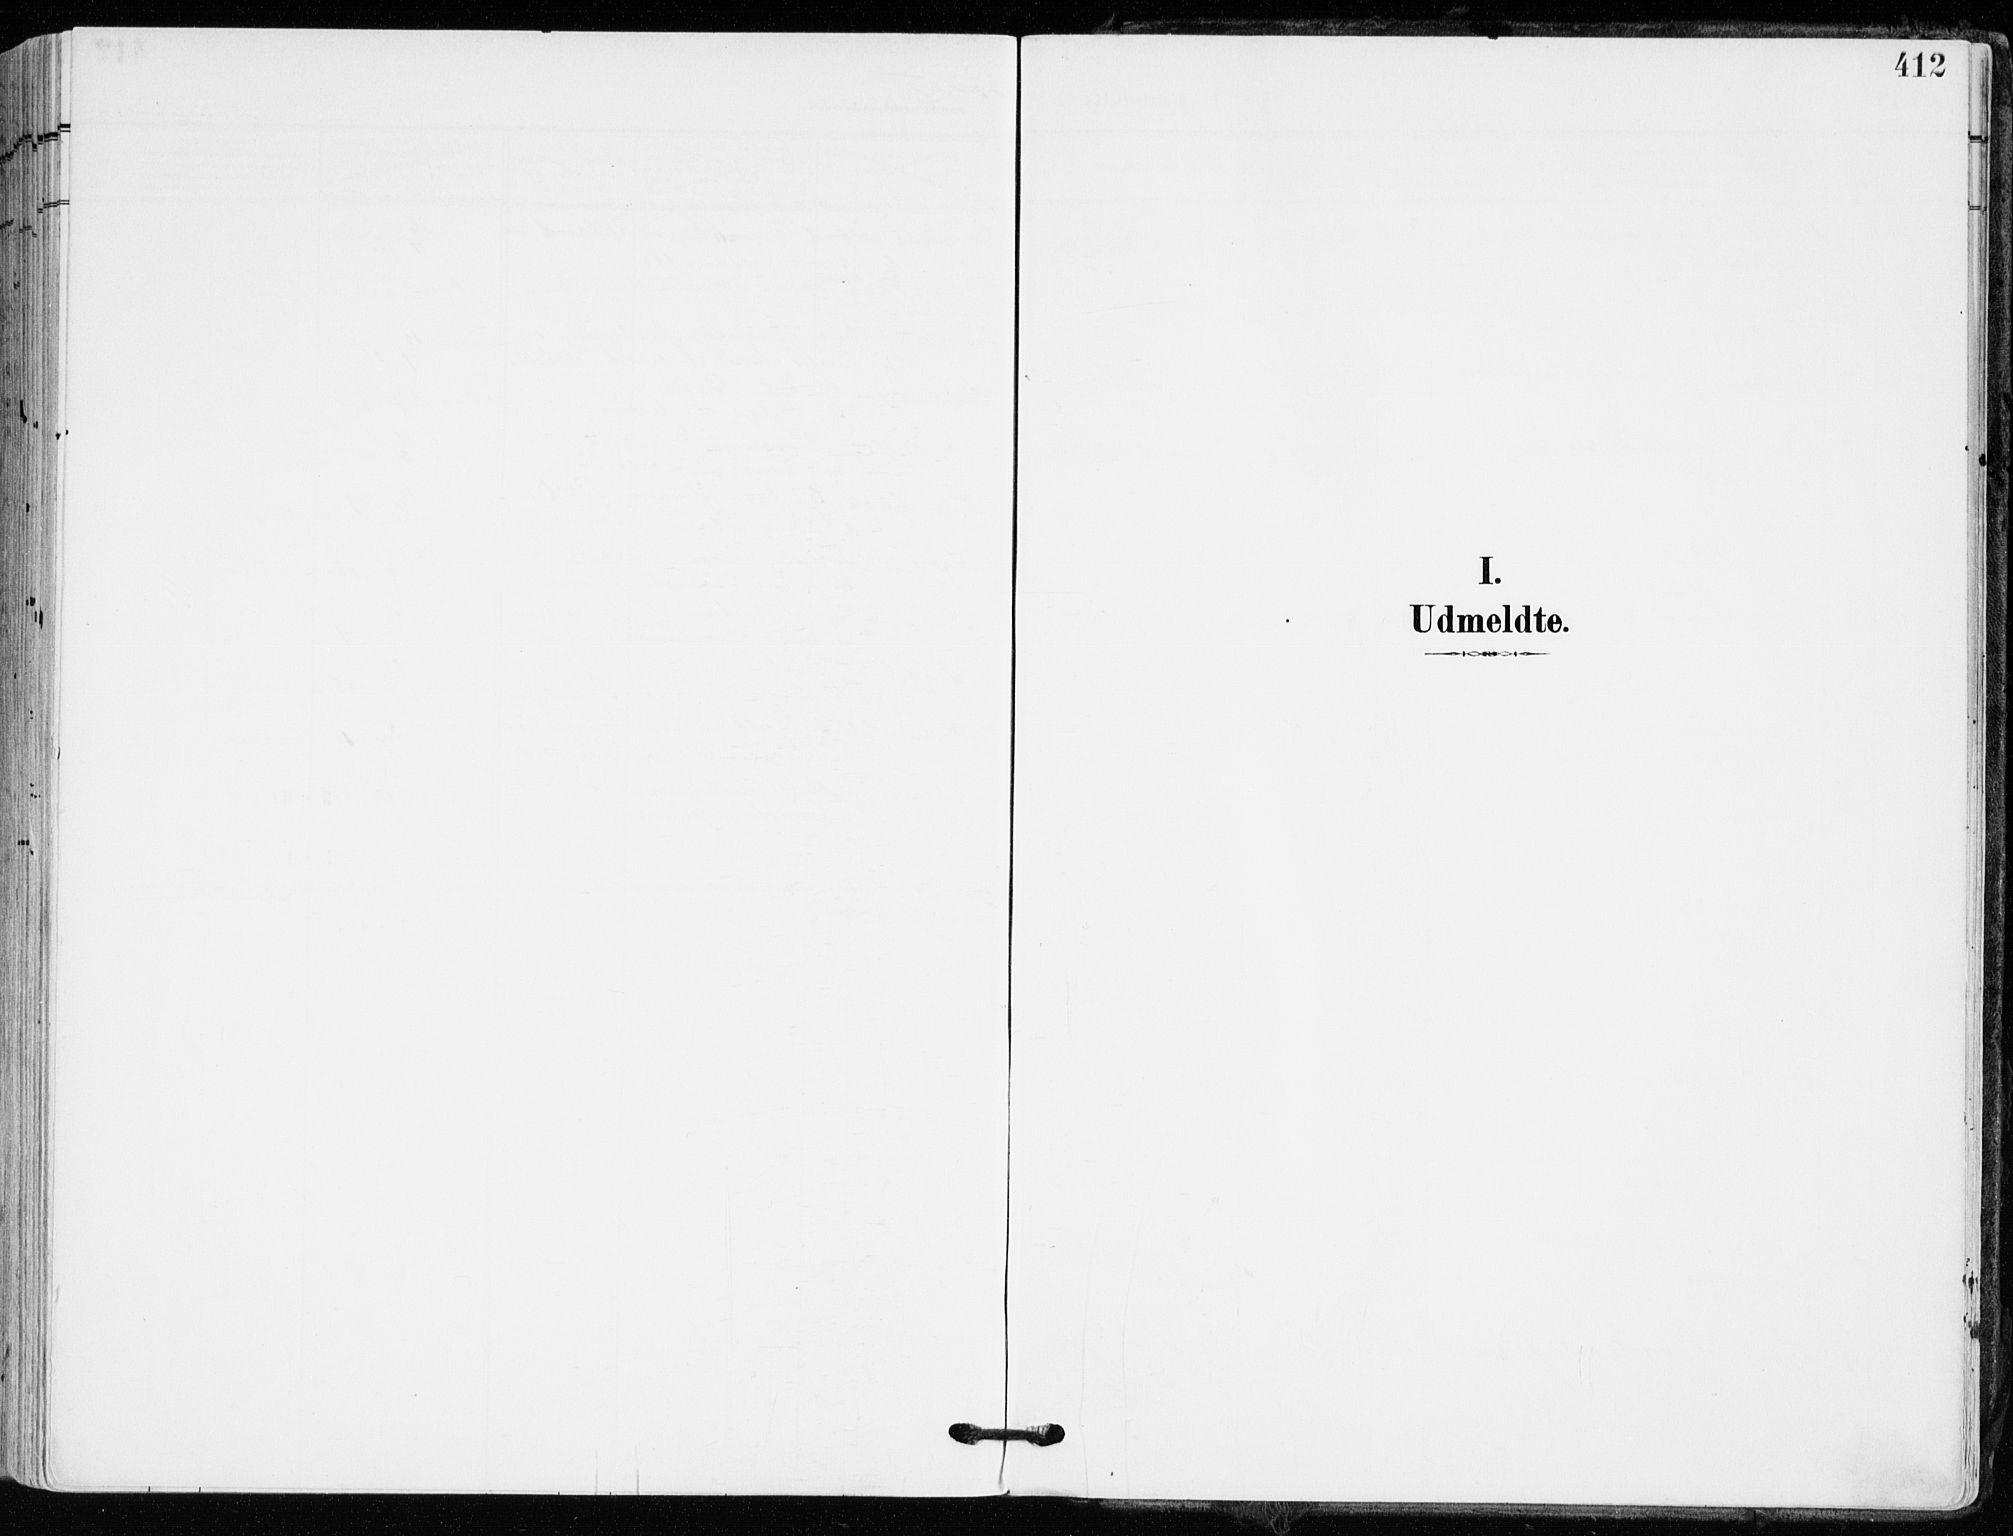 SAKO, Kongsberg kirkebøker, F/Fb/L0004: Ministerialbok nr. II 4, 1906-1918, s. 412